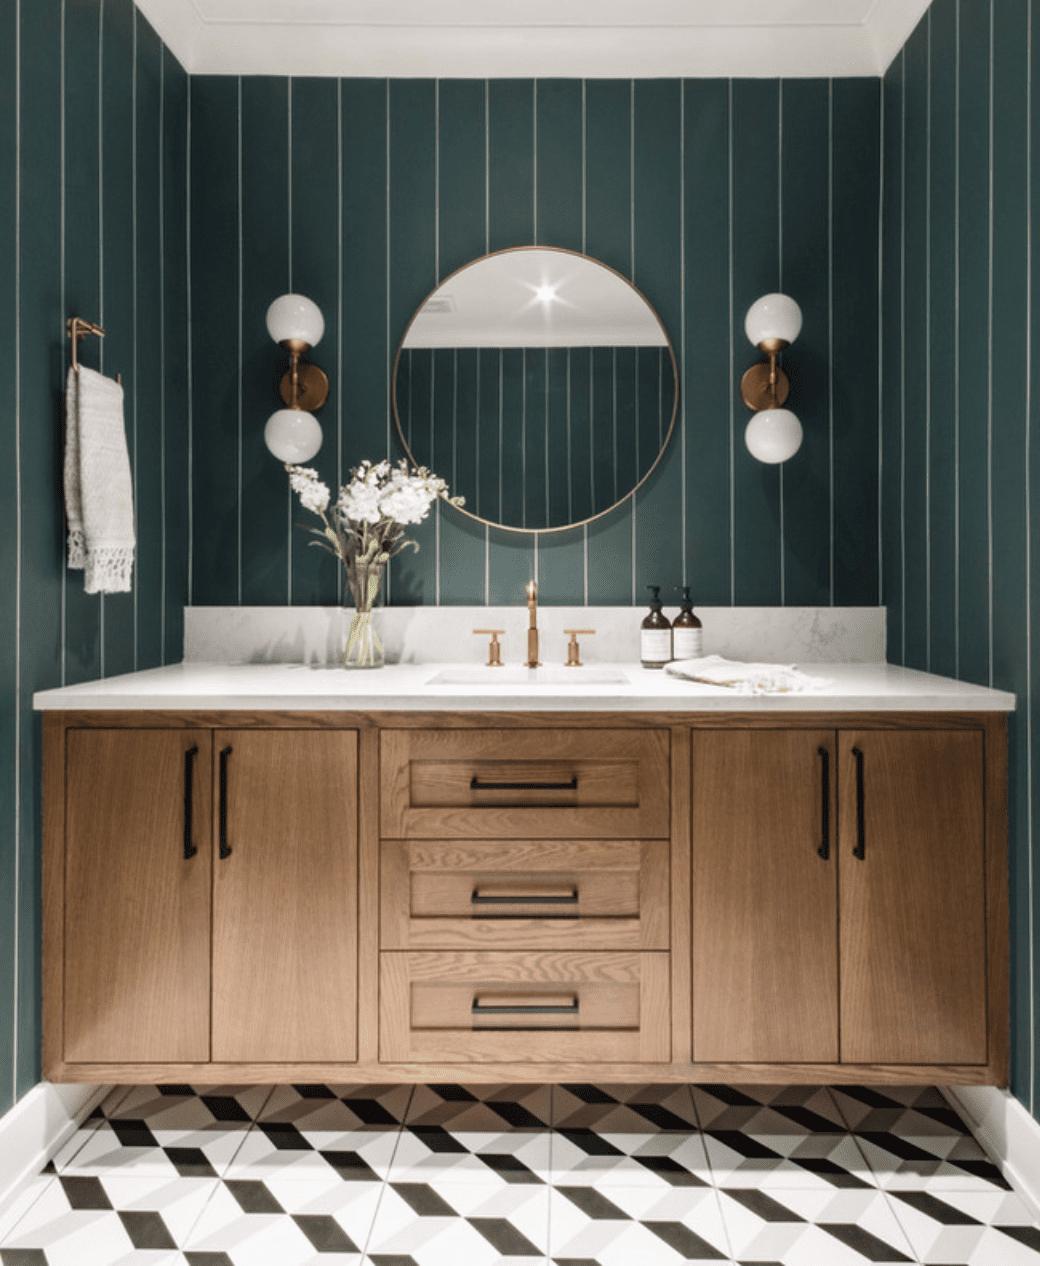 Art Deco Bathroom Design Decor Ideas, Art Deco Bathroom